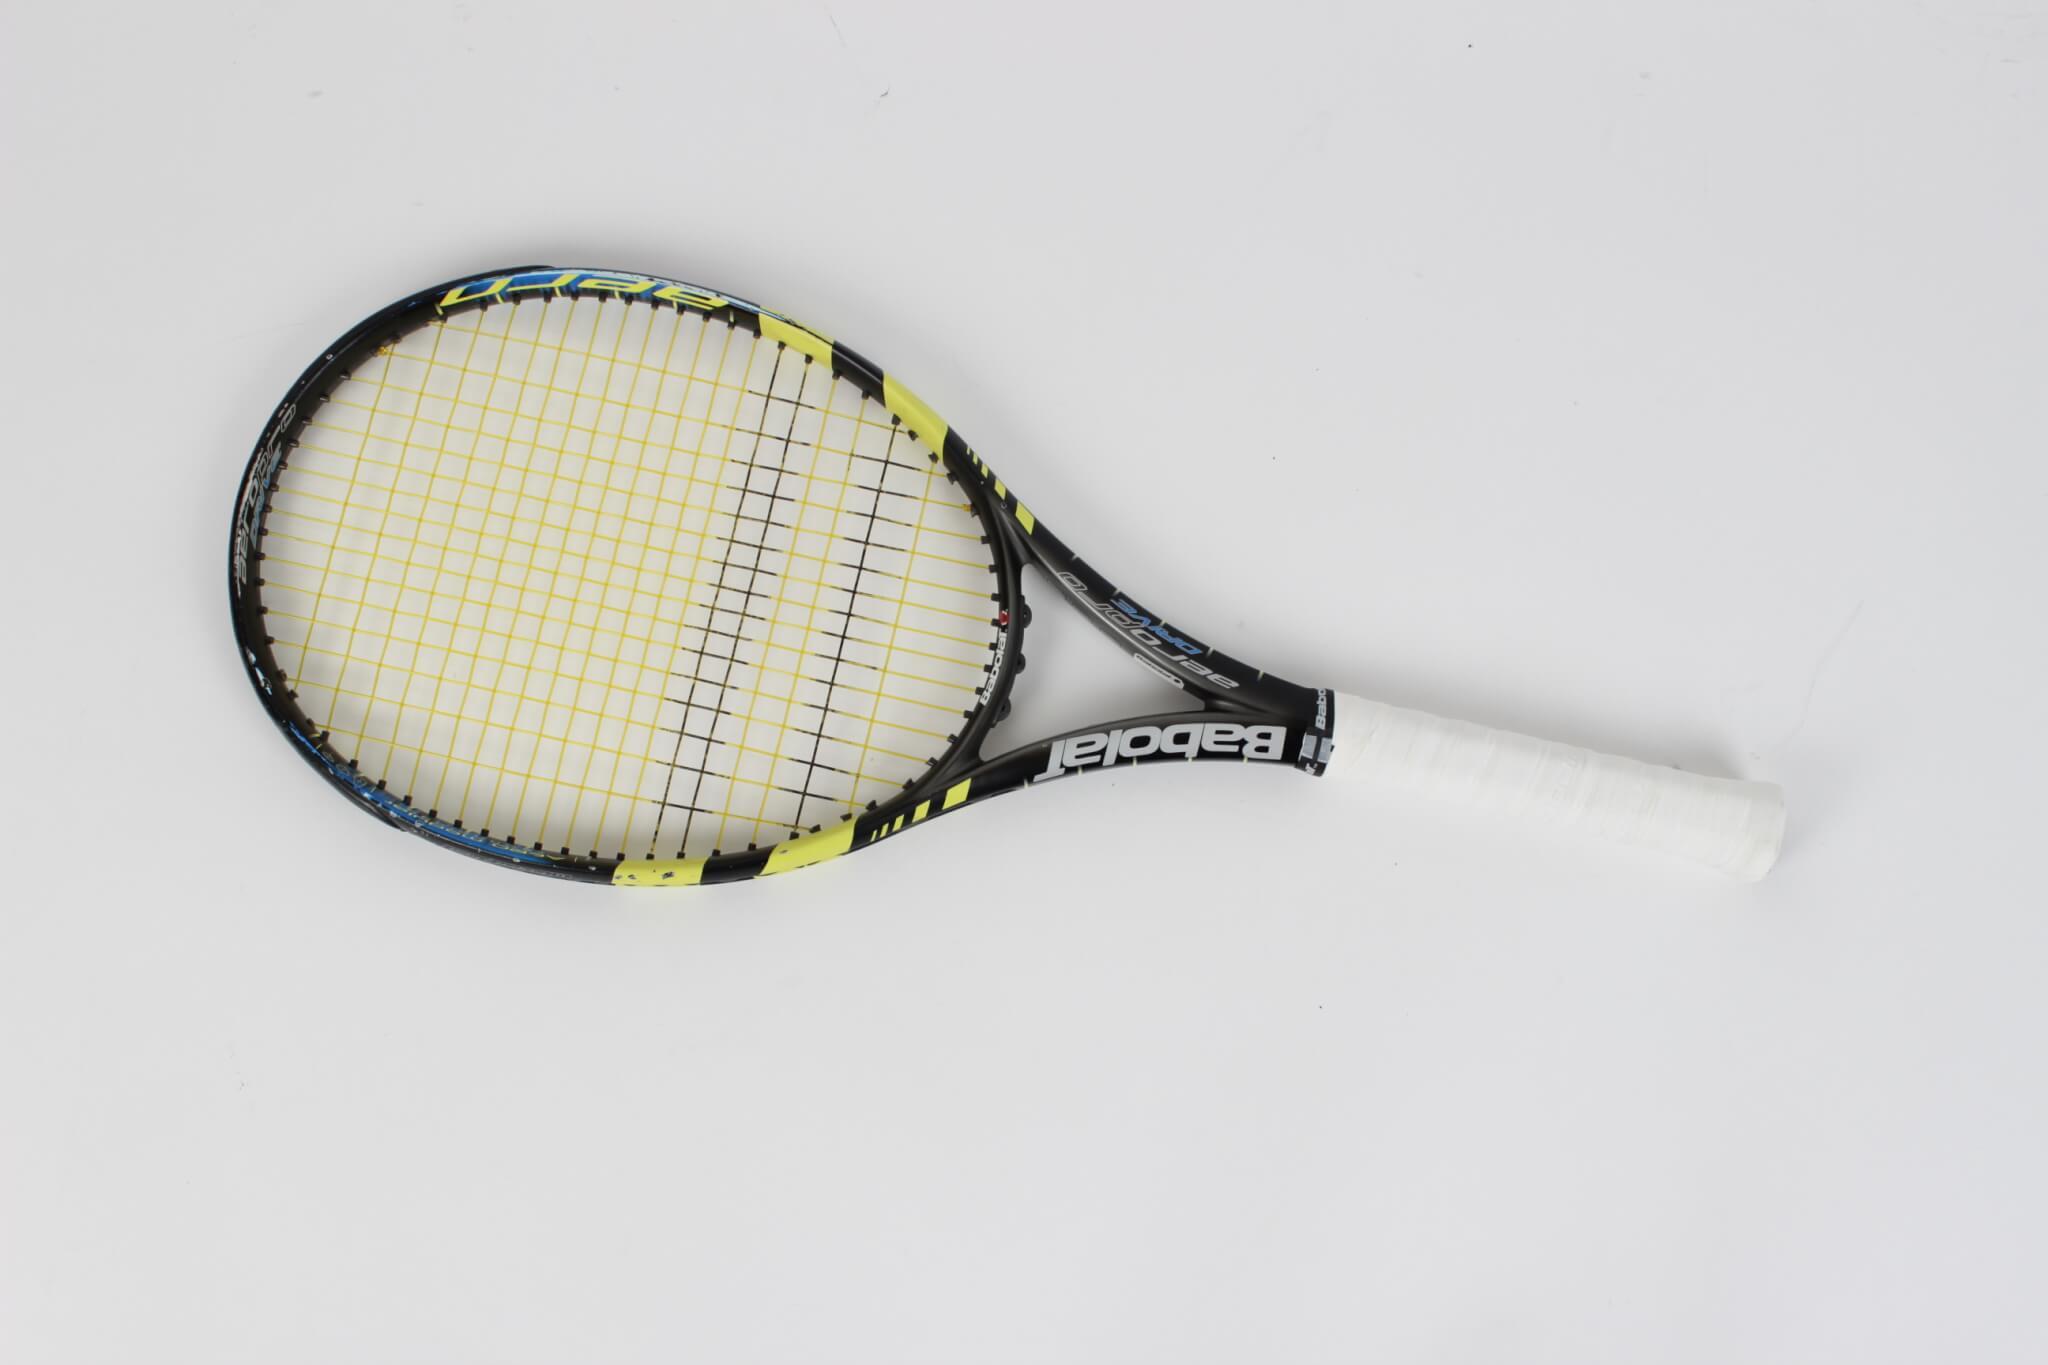 5b781325829 Rafael nadal game used match used babolat aeropro tennis racquet jpg  2048x1365 Rafael nadal tennis racquet